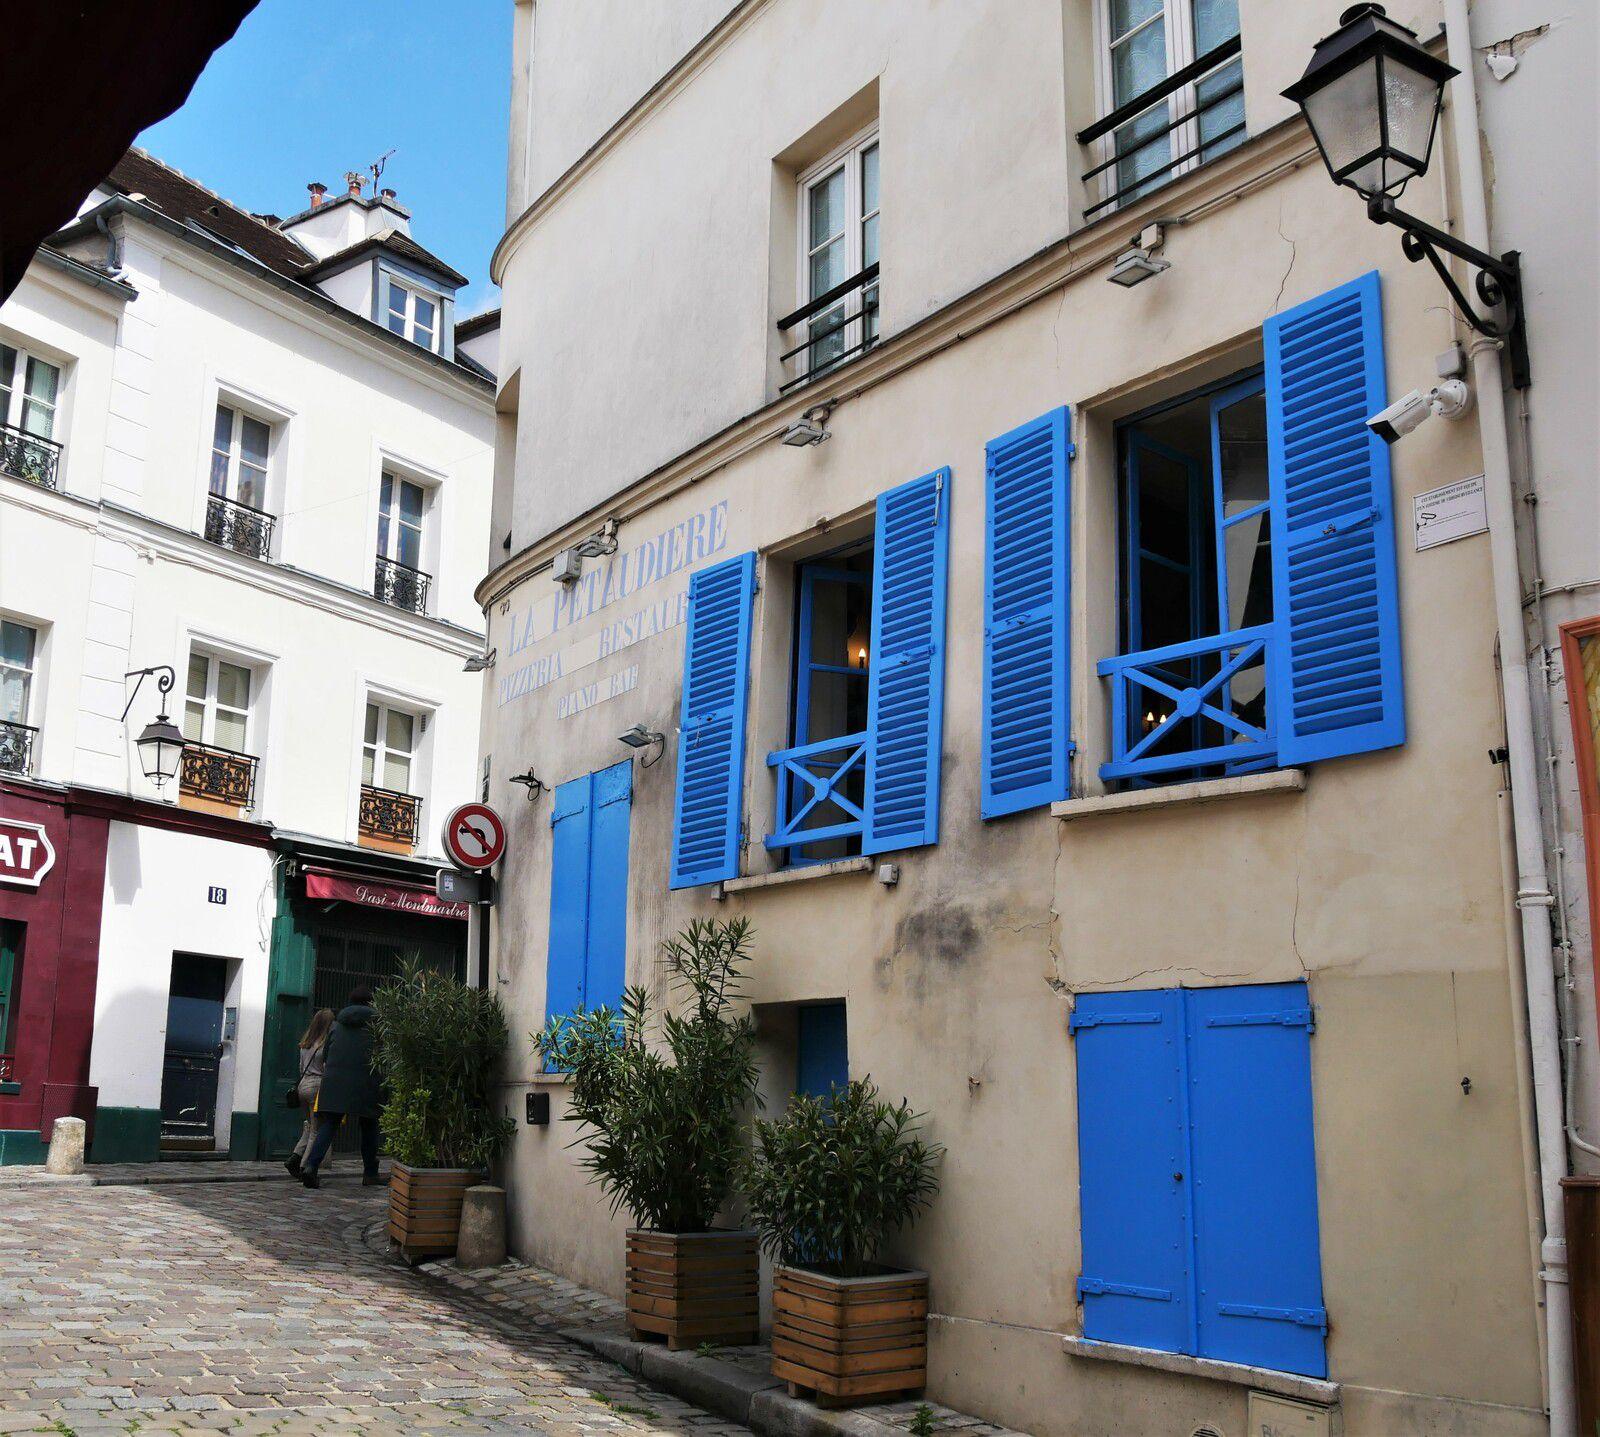 Album photos de Montmartre en mai 2021